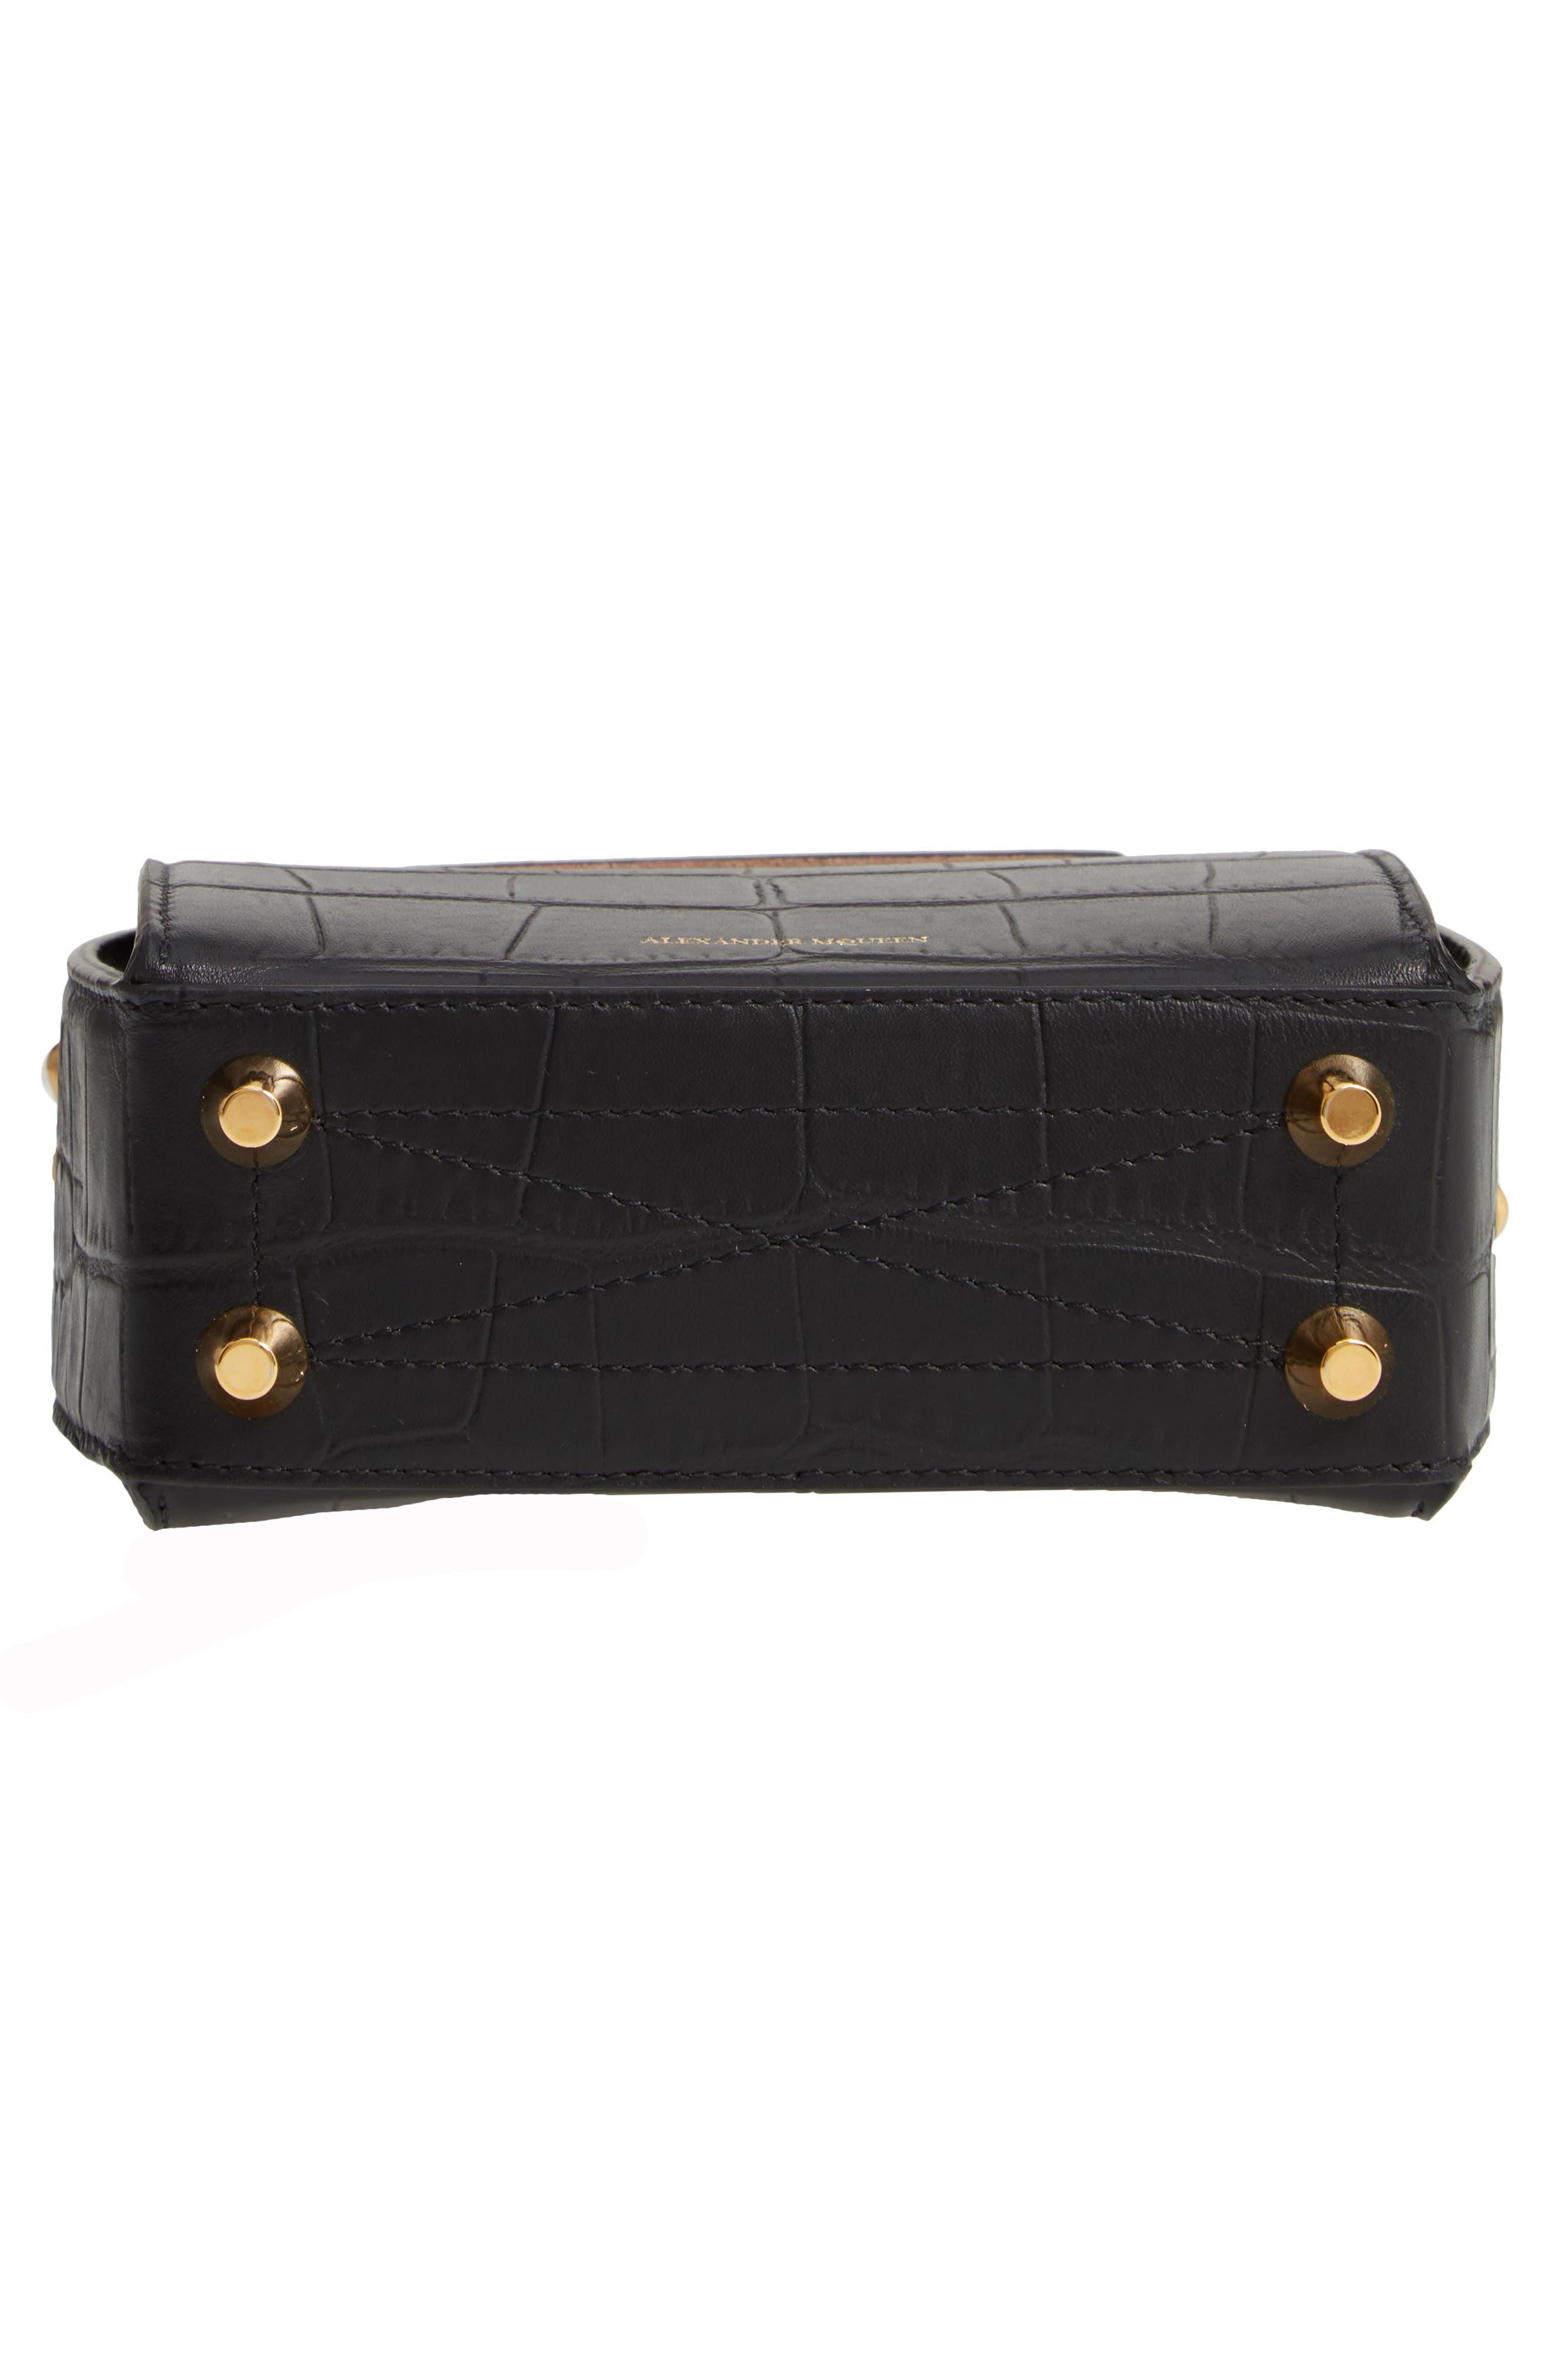 ALEXANDER MCQUEEN,                             Mini Box Croc-Embossed Leather Bag,                             Alternate thumbnail 7, color,                             001